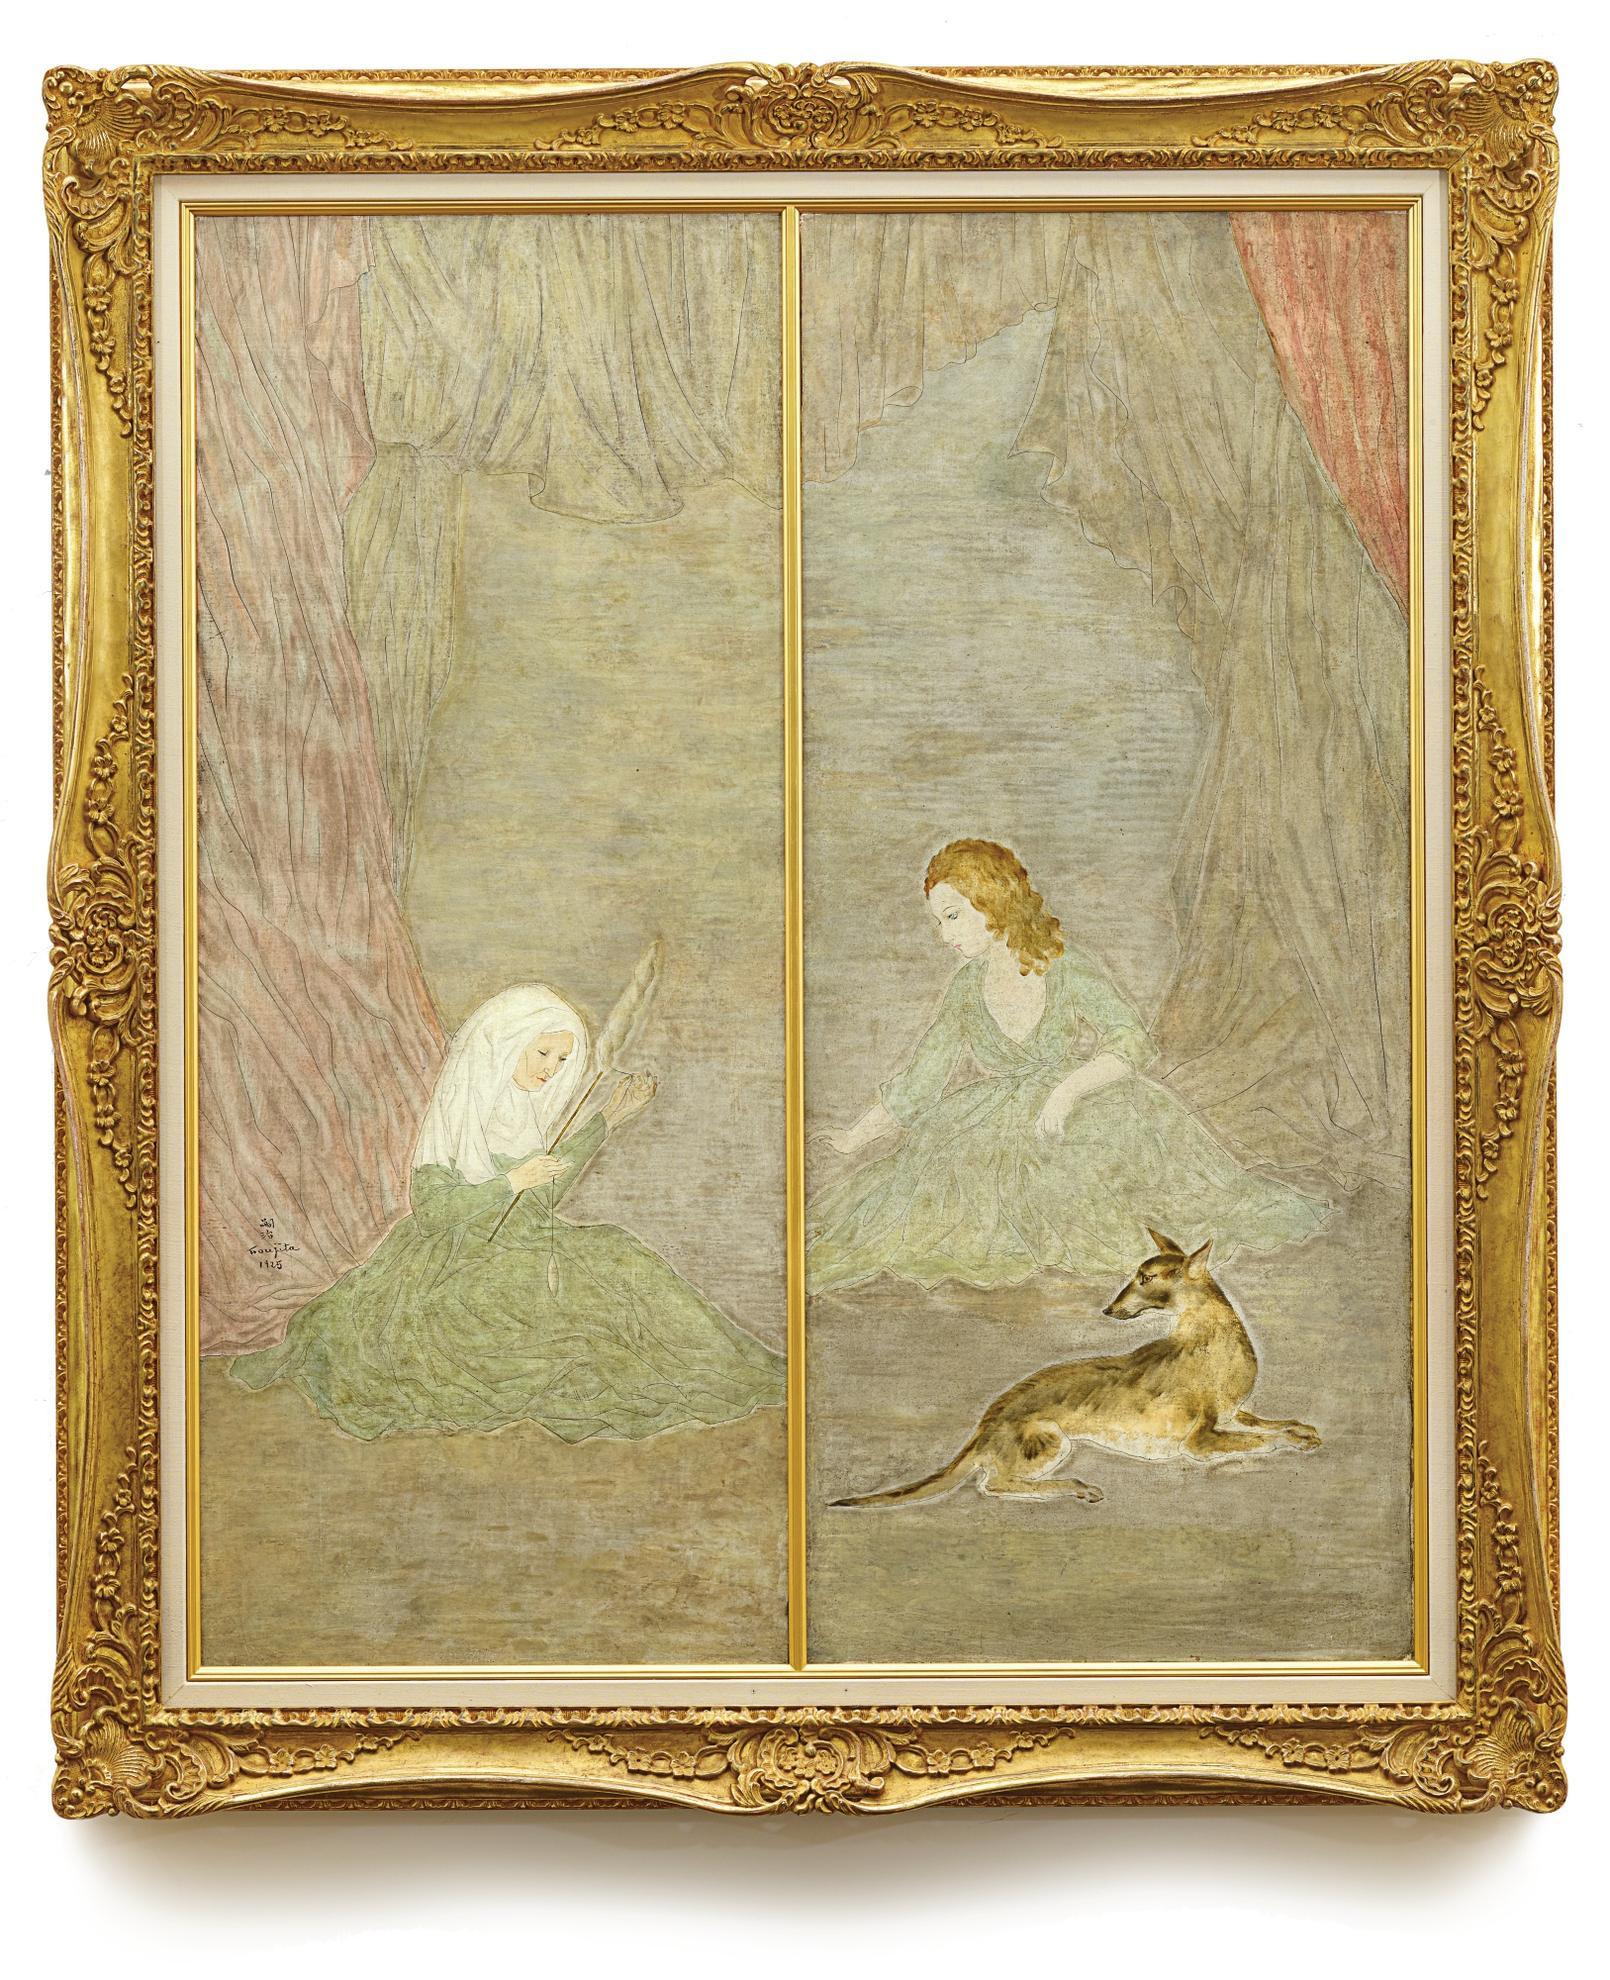 Tsuguharu Foujita-Fileuse Et Jeune Fille Au Chien (Diptych)-1925